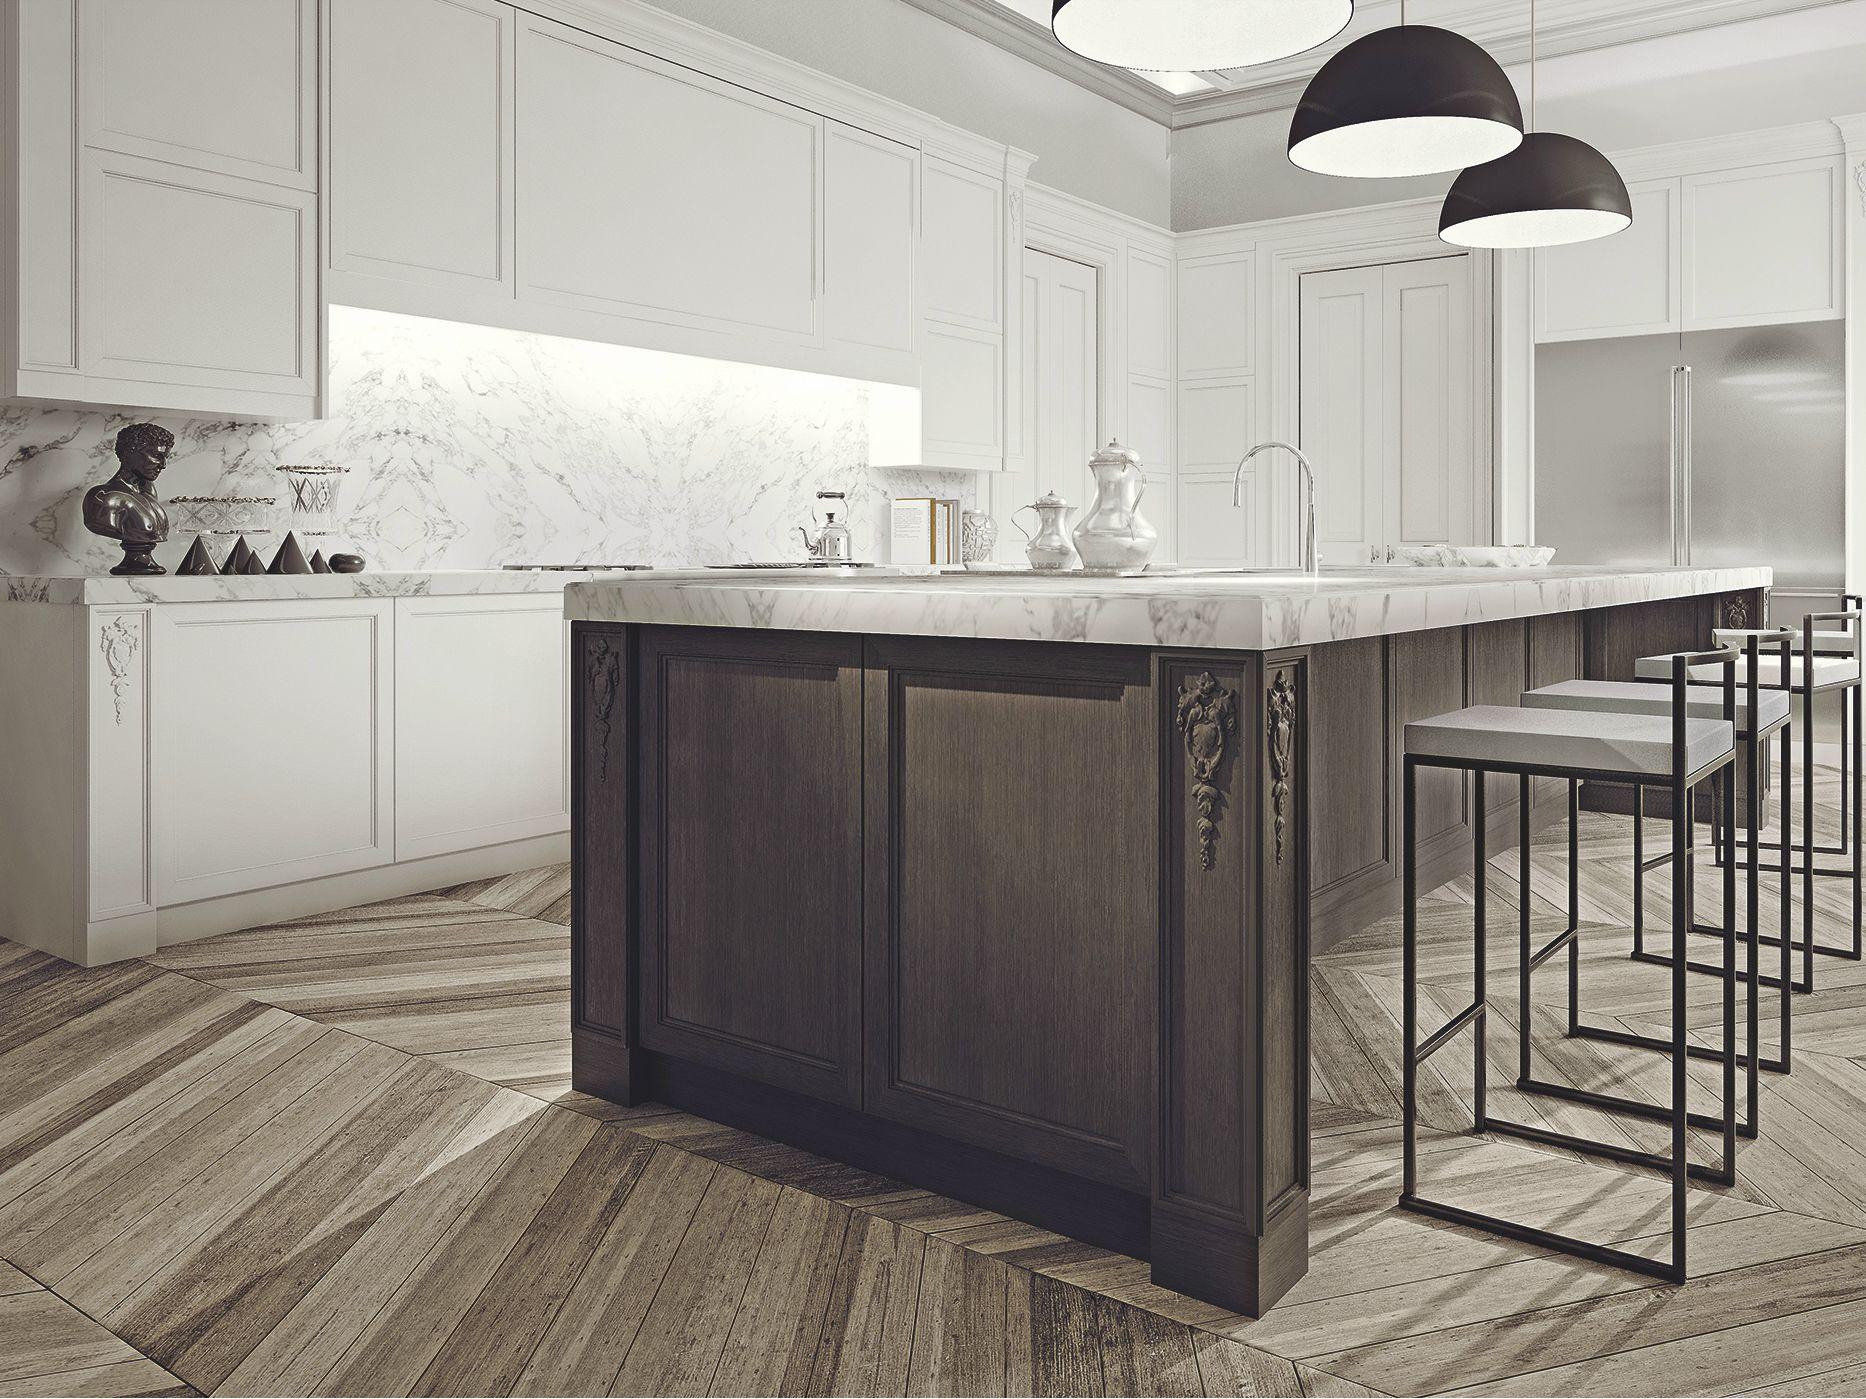 AETERNA | Cucina by L\'Origine Home Elegans | Apt design ...